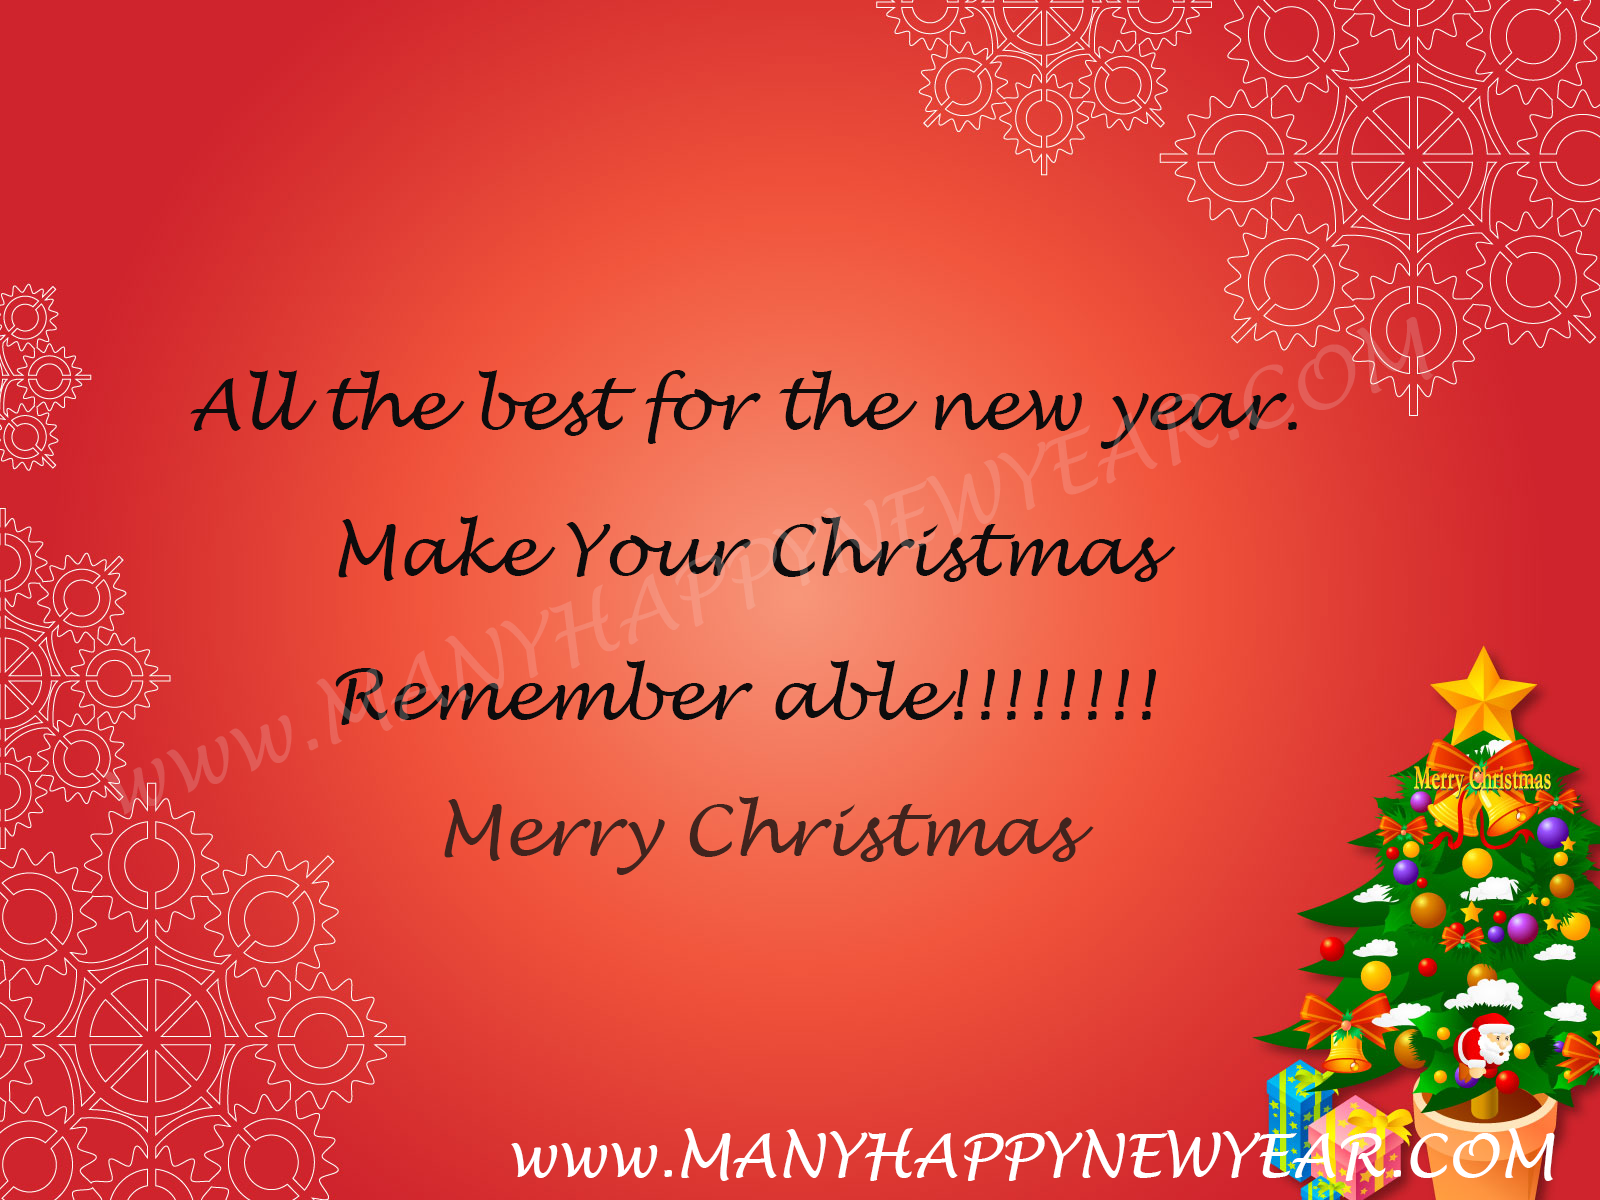 2018 happy new year cute whatsapp status messages greetings wishes - Happy Ne...